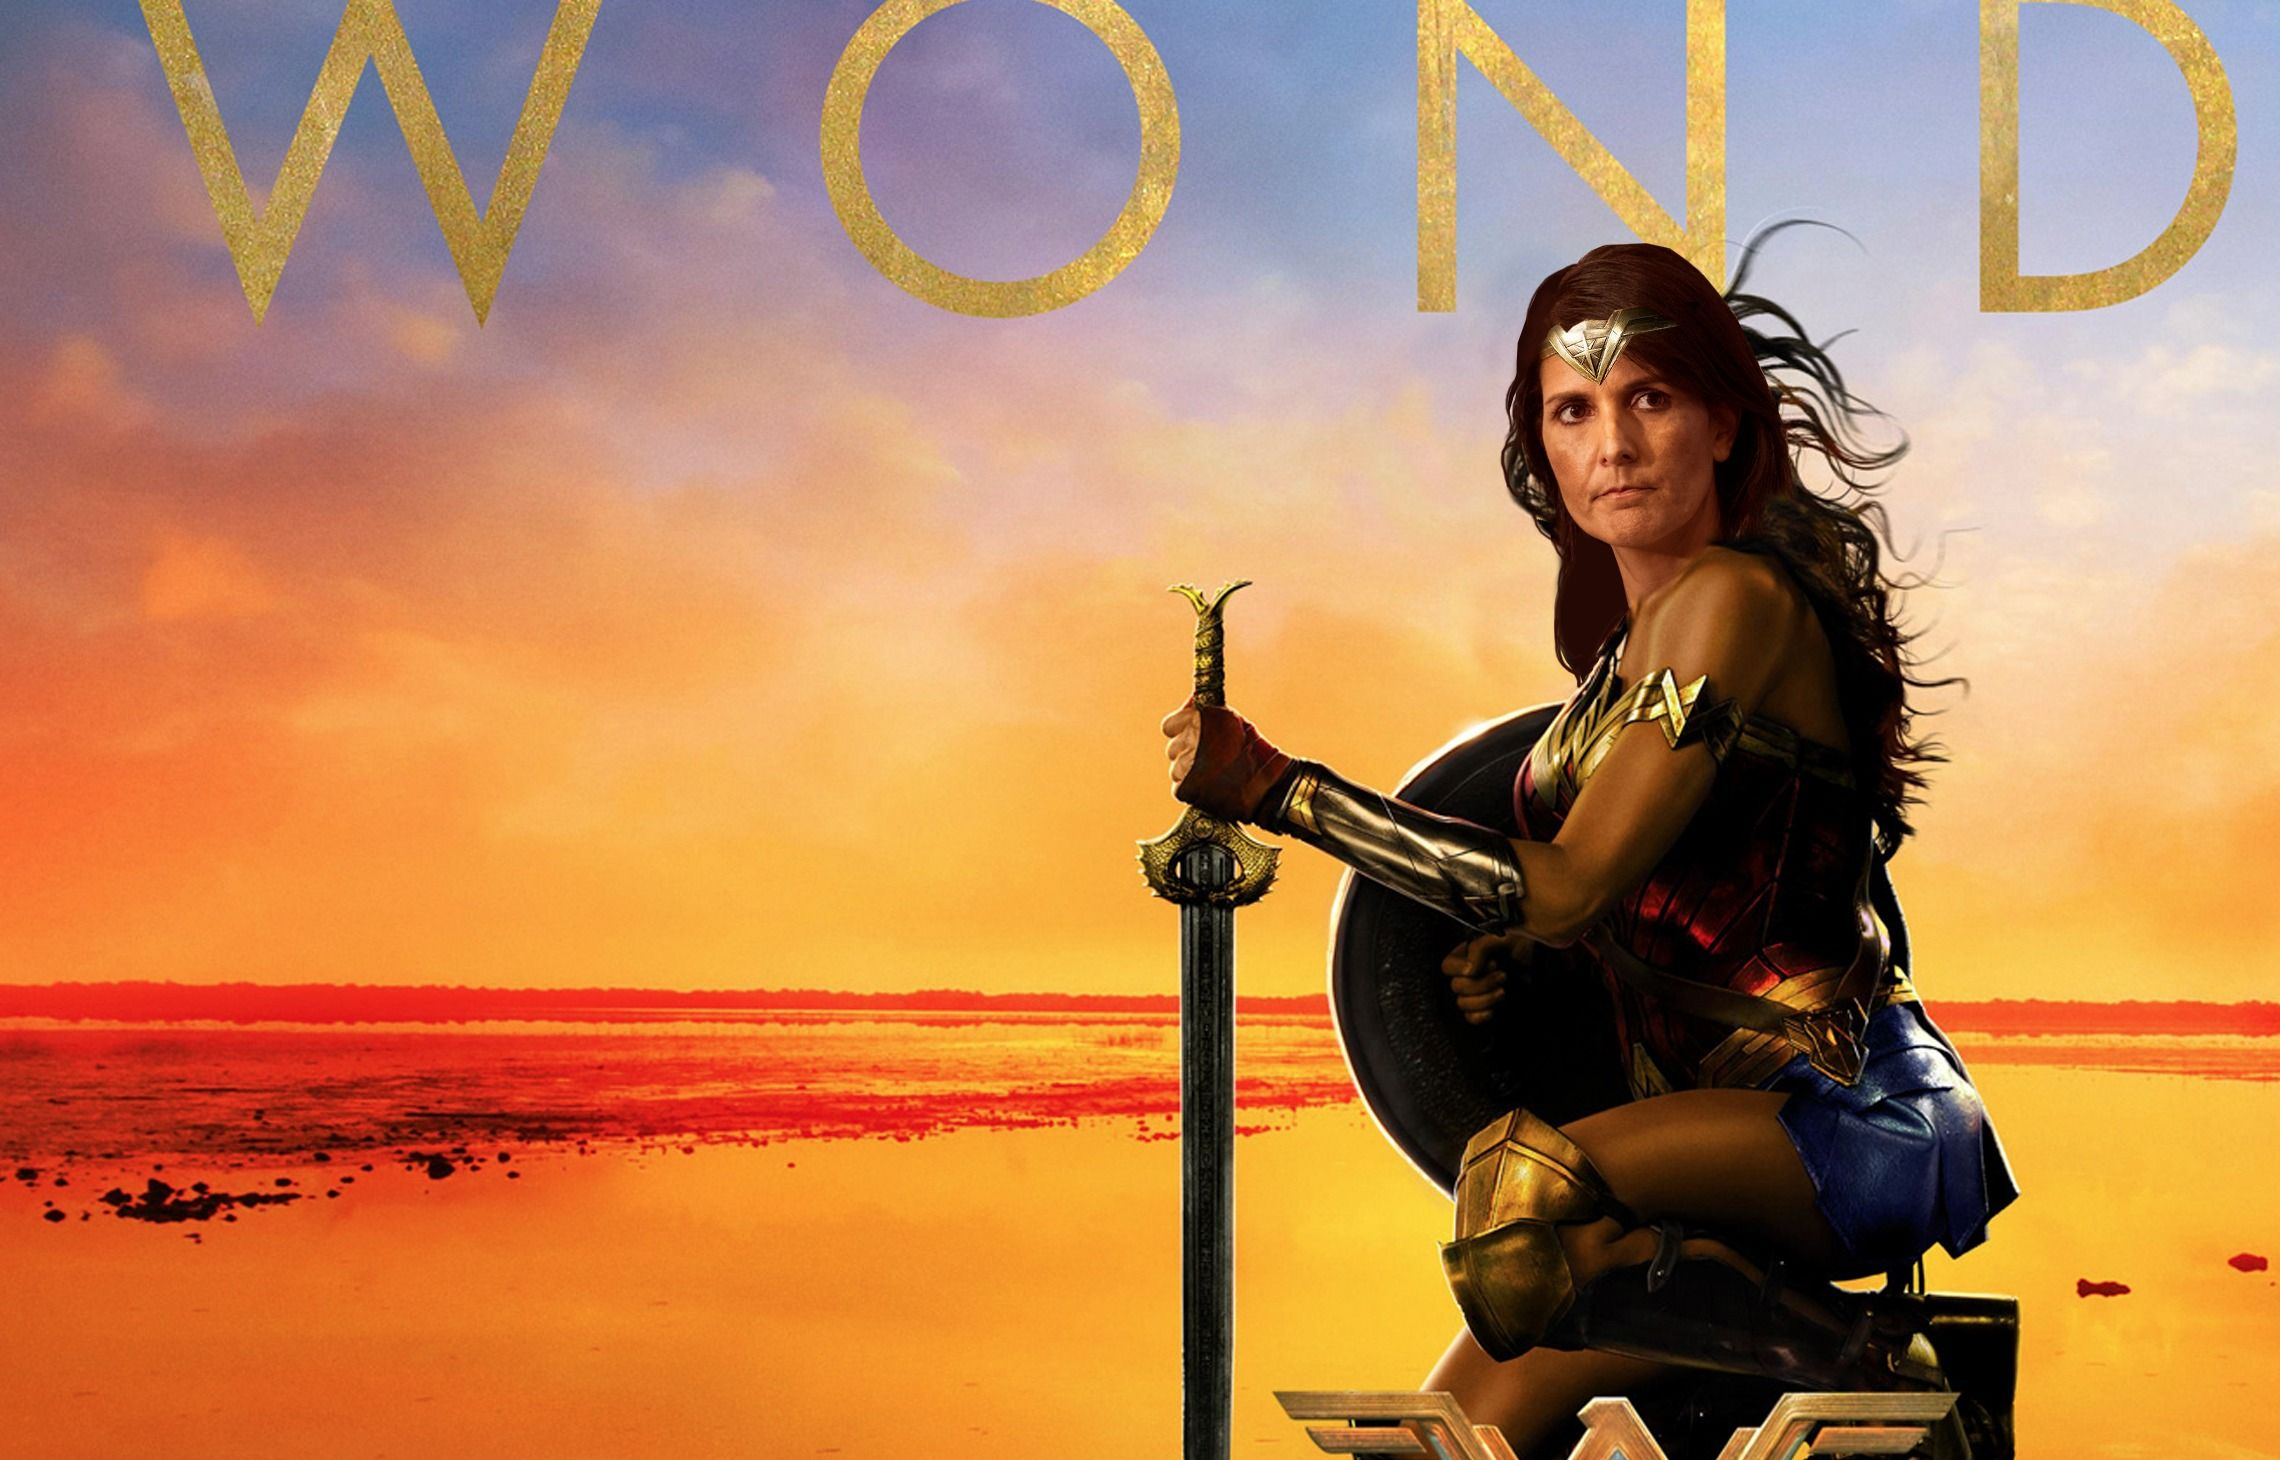 Israelis see U.N. Ambassador Nikki Haley as their defender, a kind of political Wonder Woman.